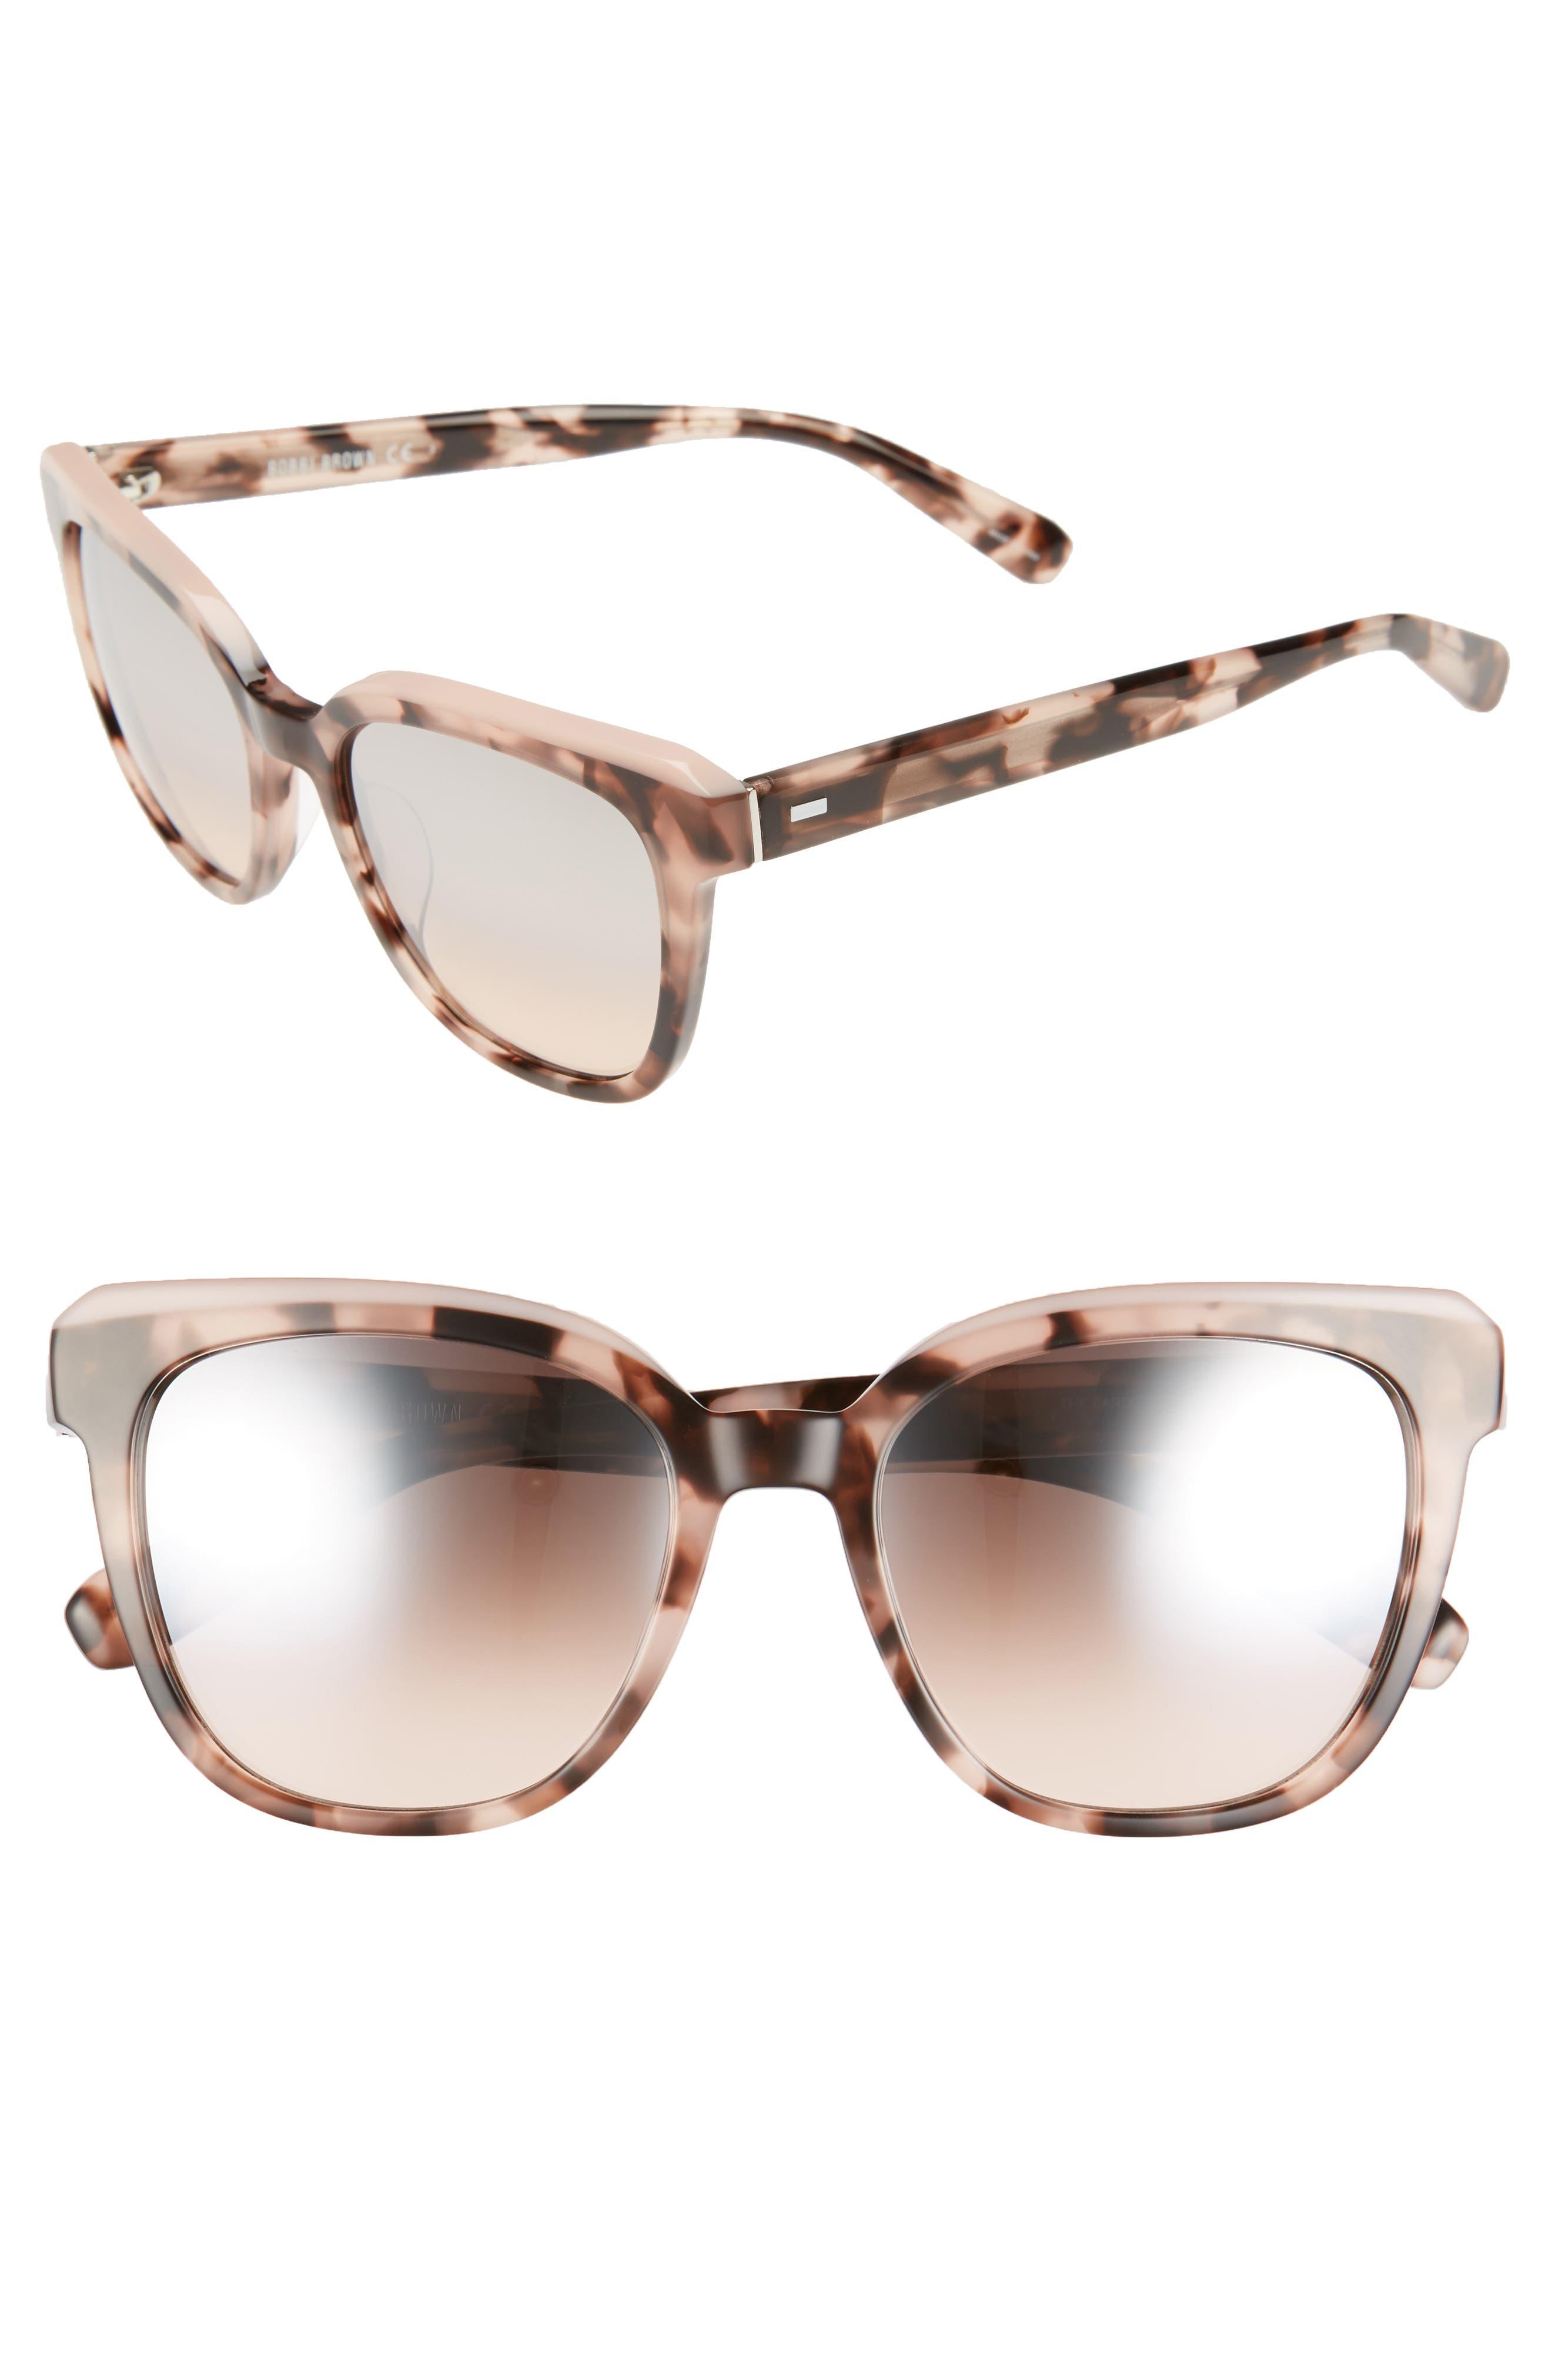 Main Image - Bobbi Brown The Bardot 53mm Gradient Sunglasses